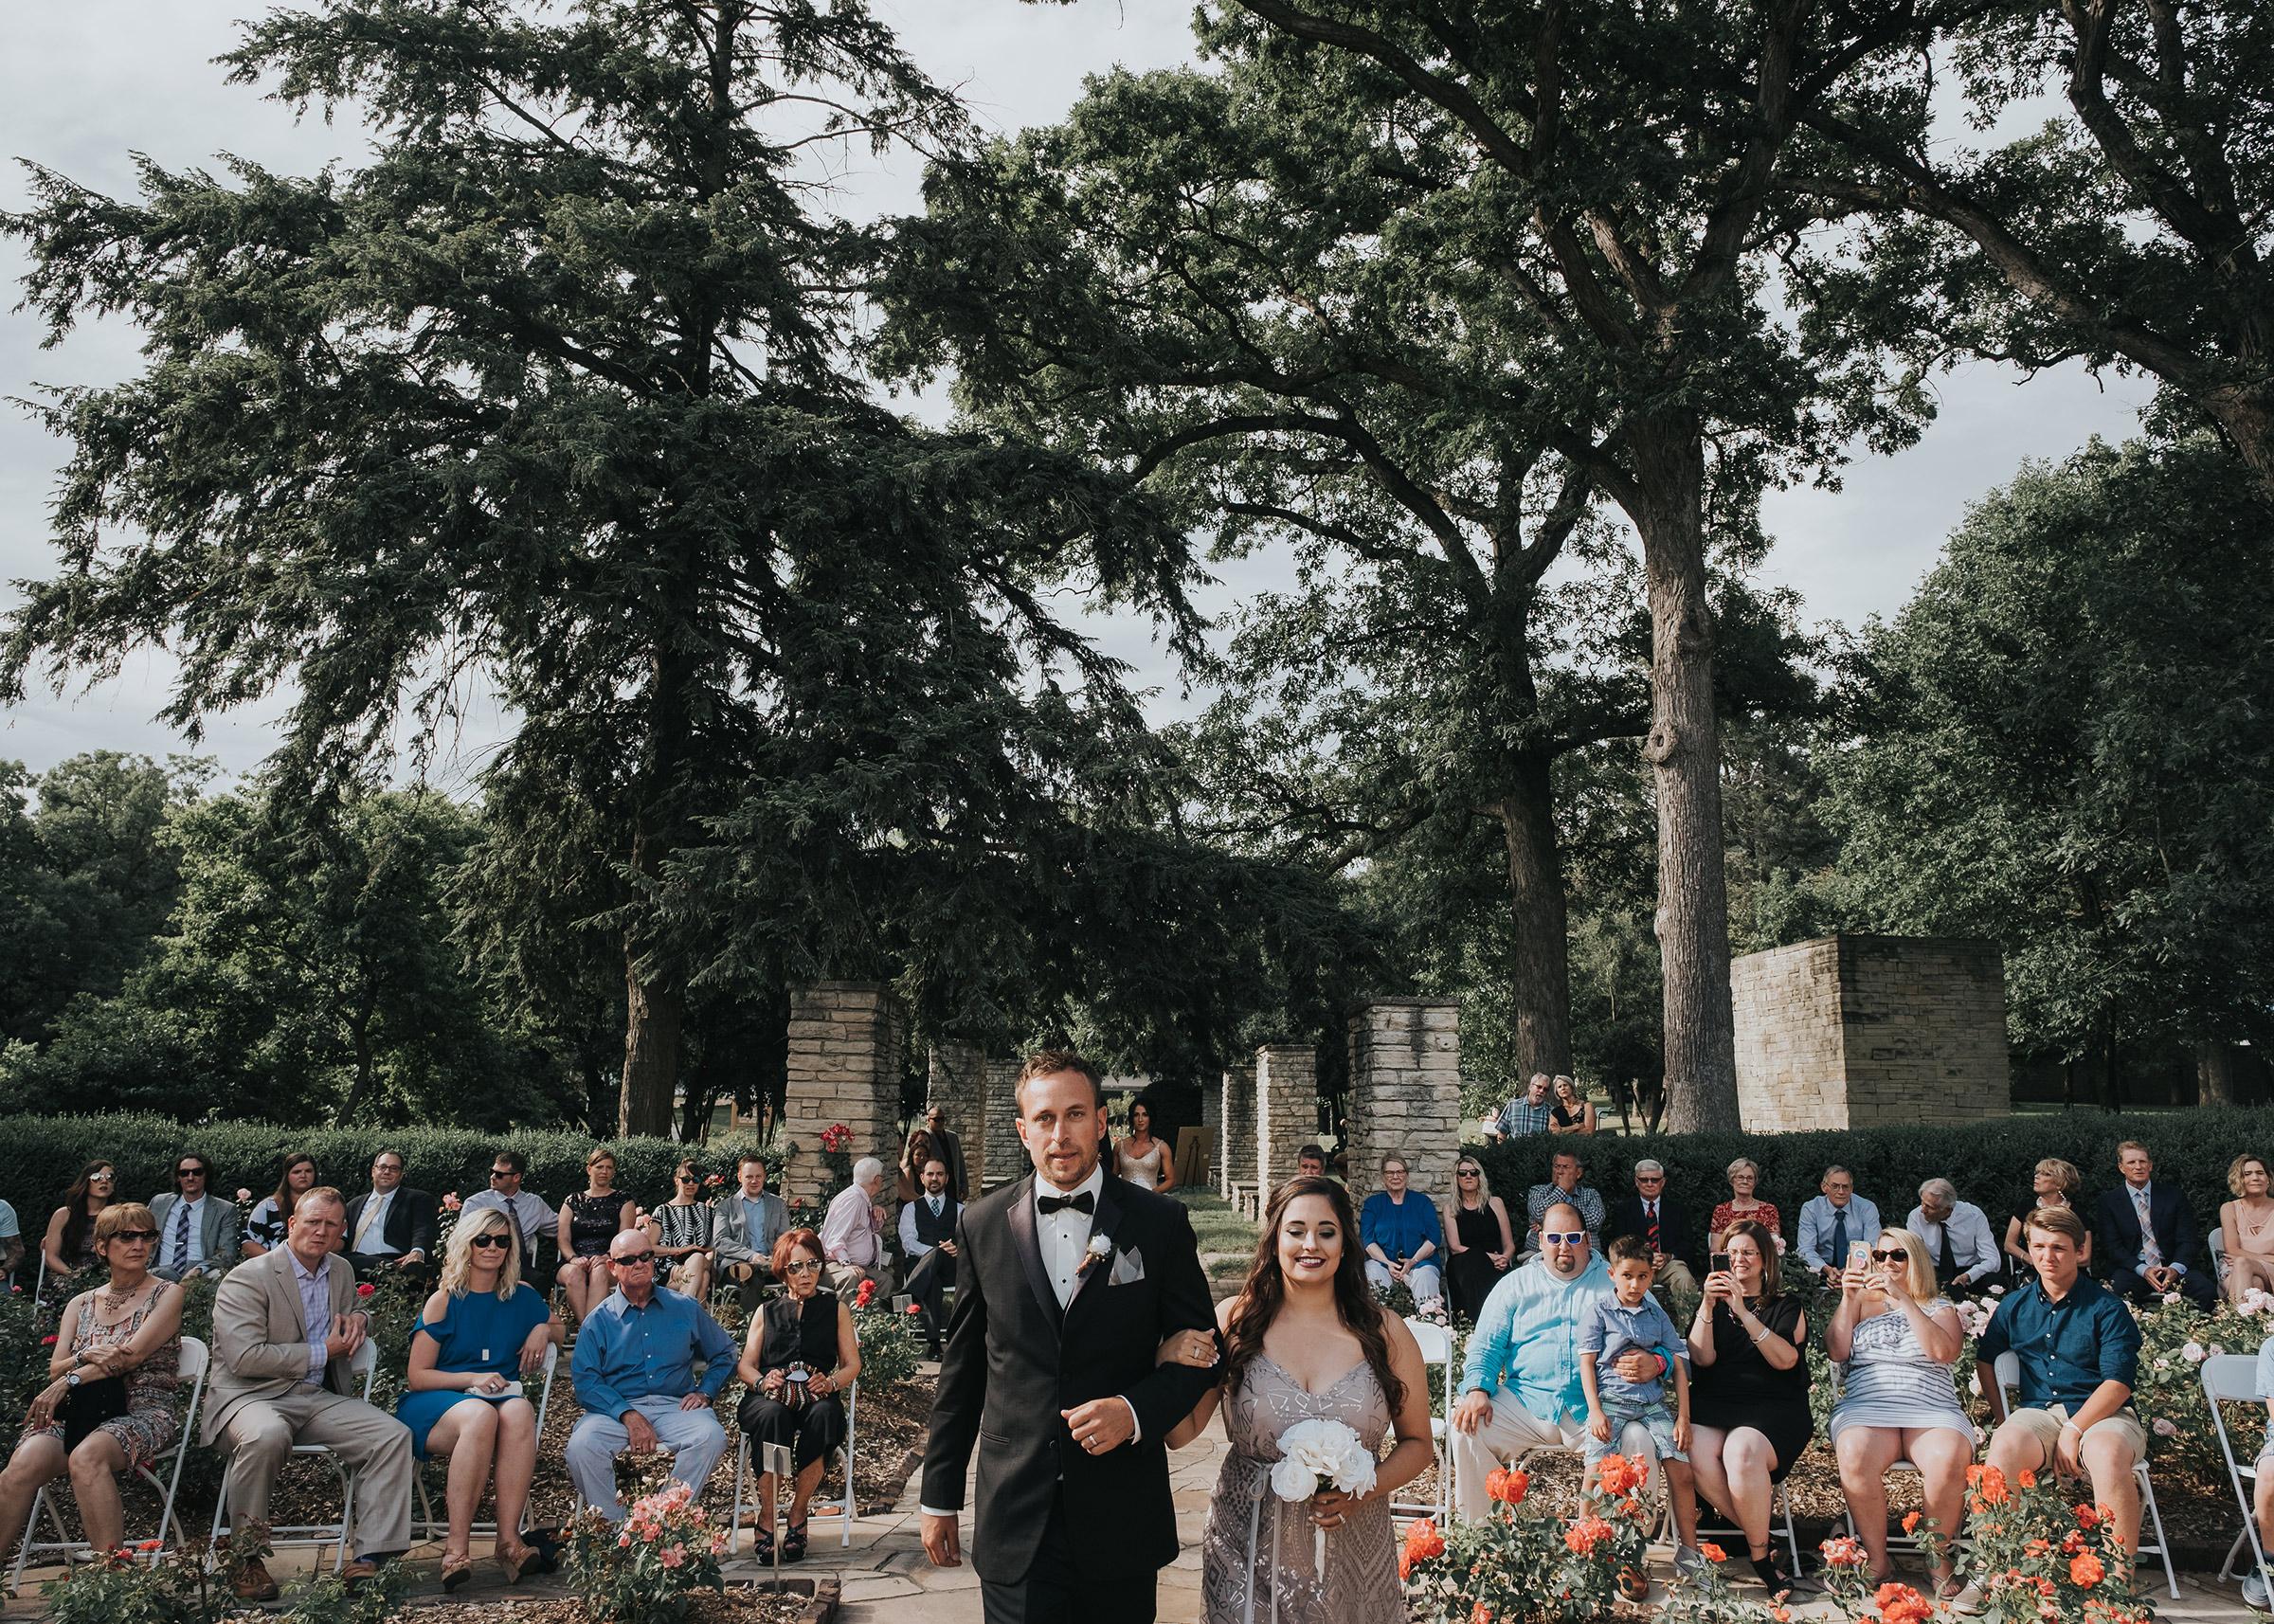 bridesmaids-groomsmen-walking-down-aisle-desmoines-iowa-rose-garden-raelyn-ramey-photography.jpg